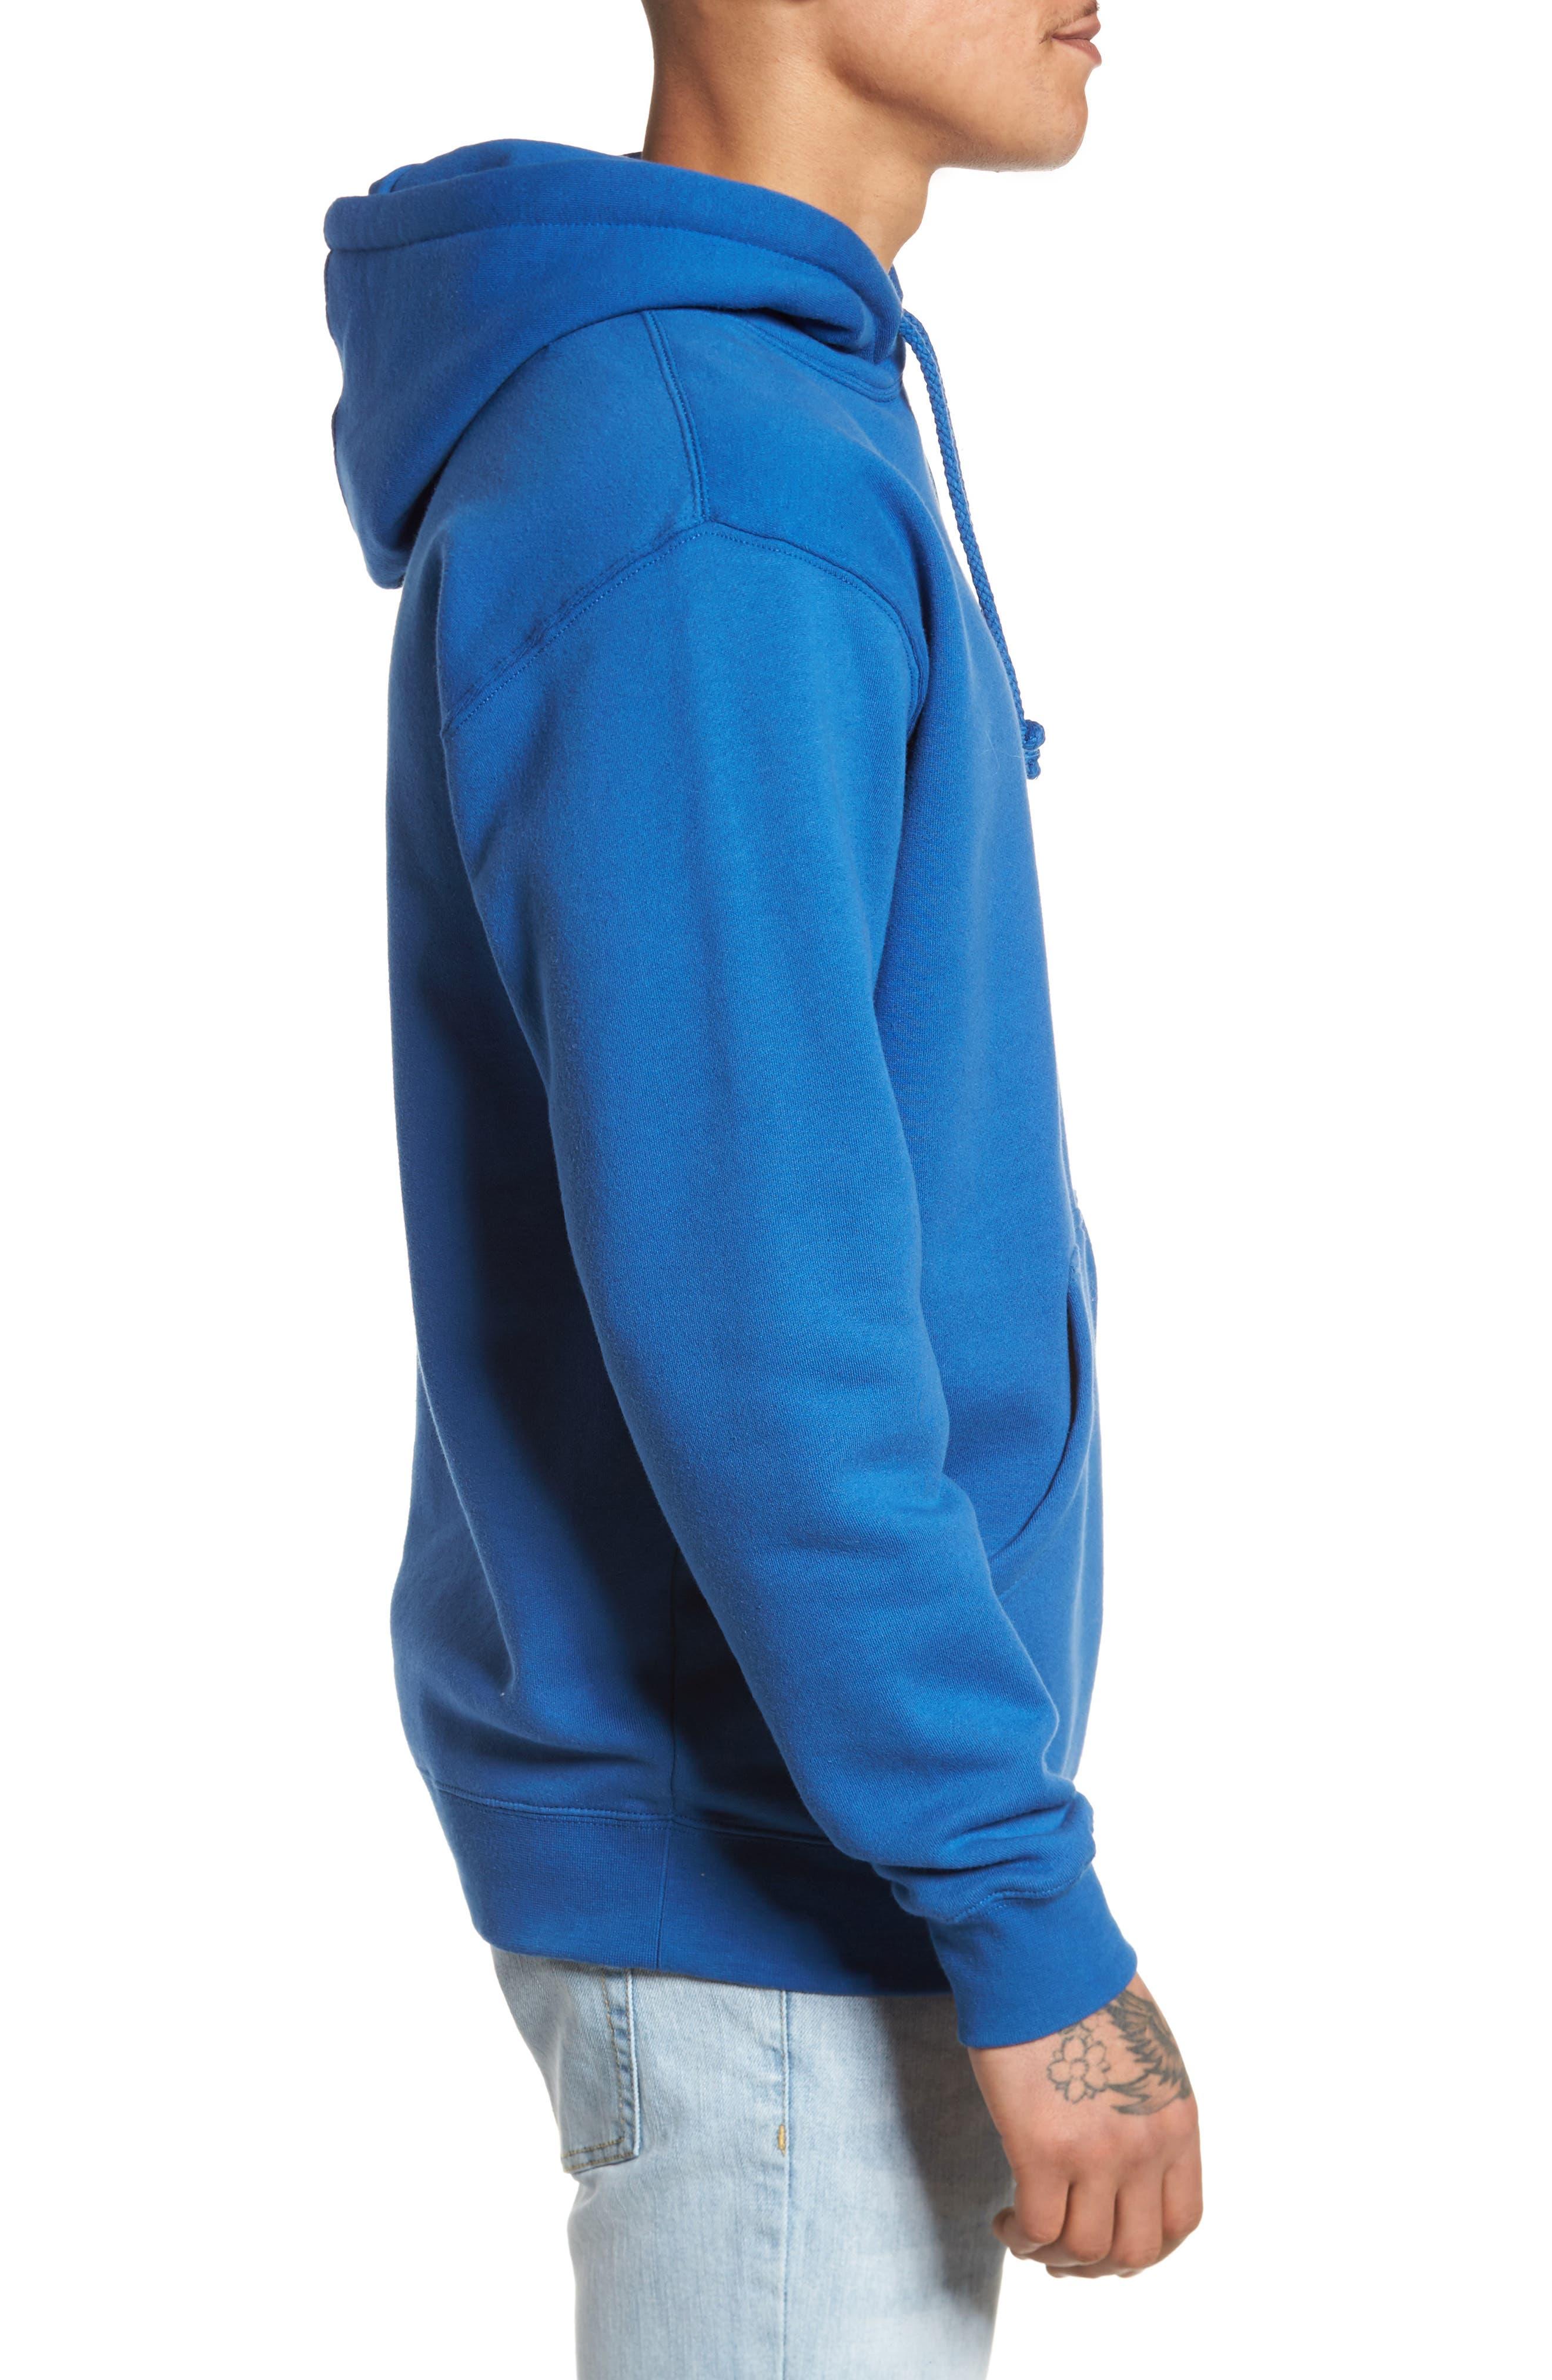 Alternate Reality Hoodie Sweatshirt,                             Alternate thumbnail 3, color,                             Royal Blue